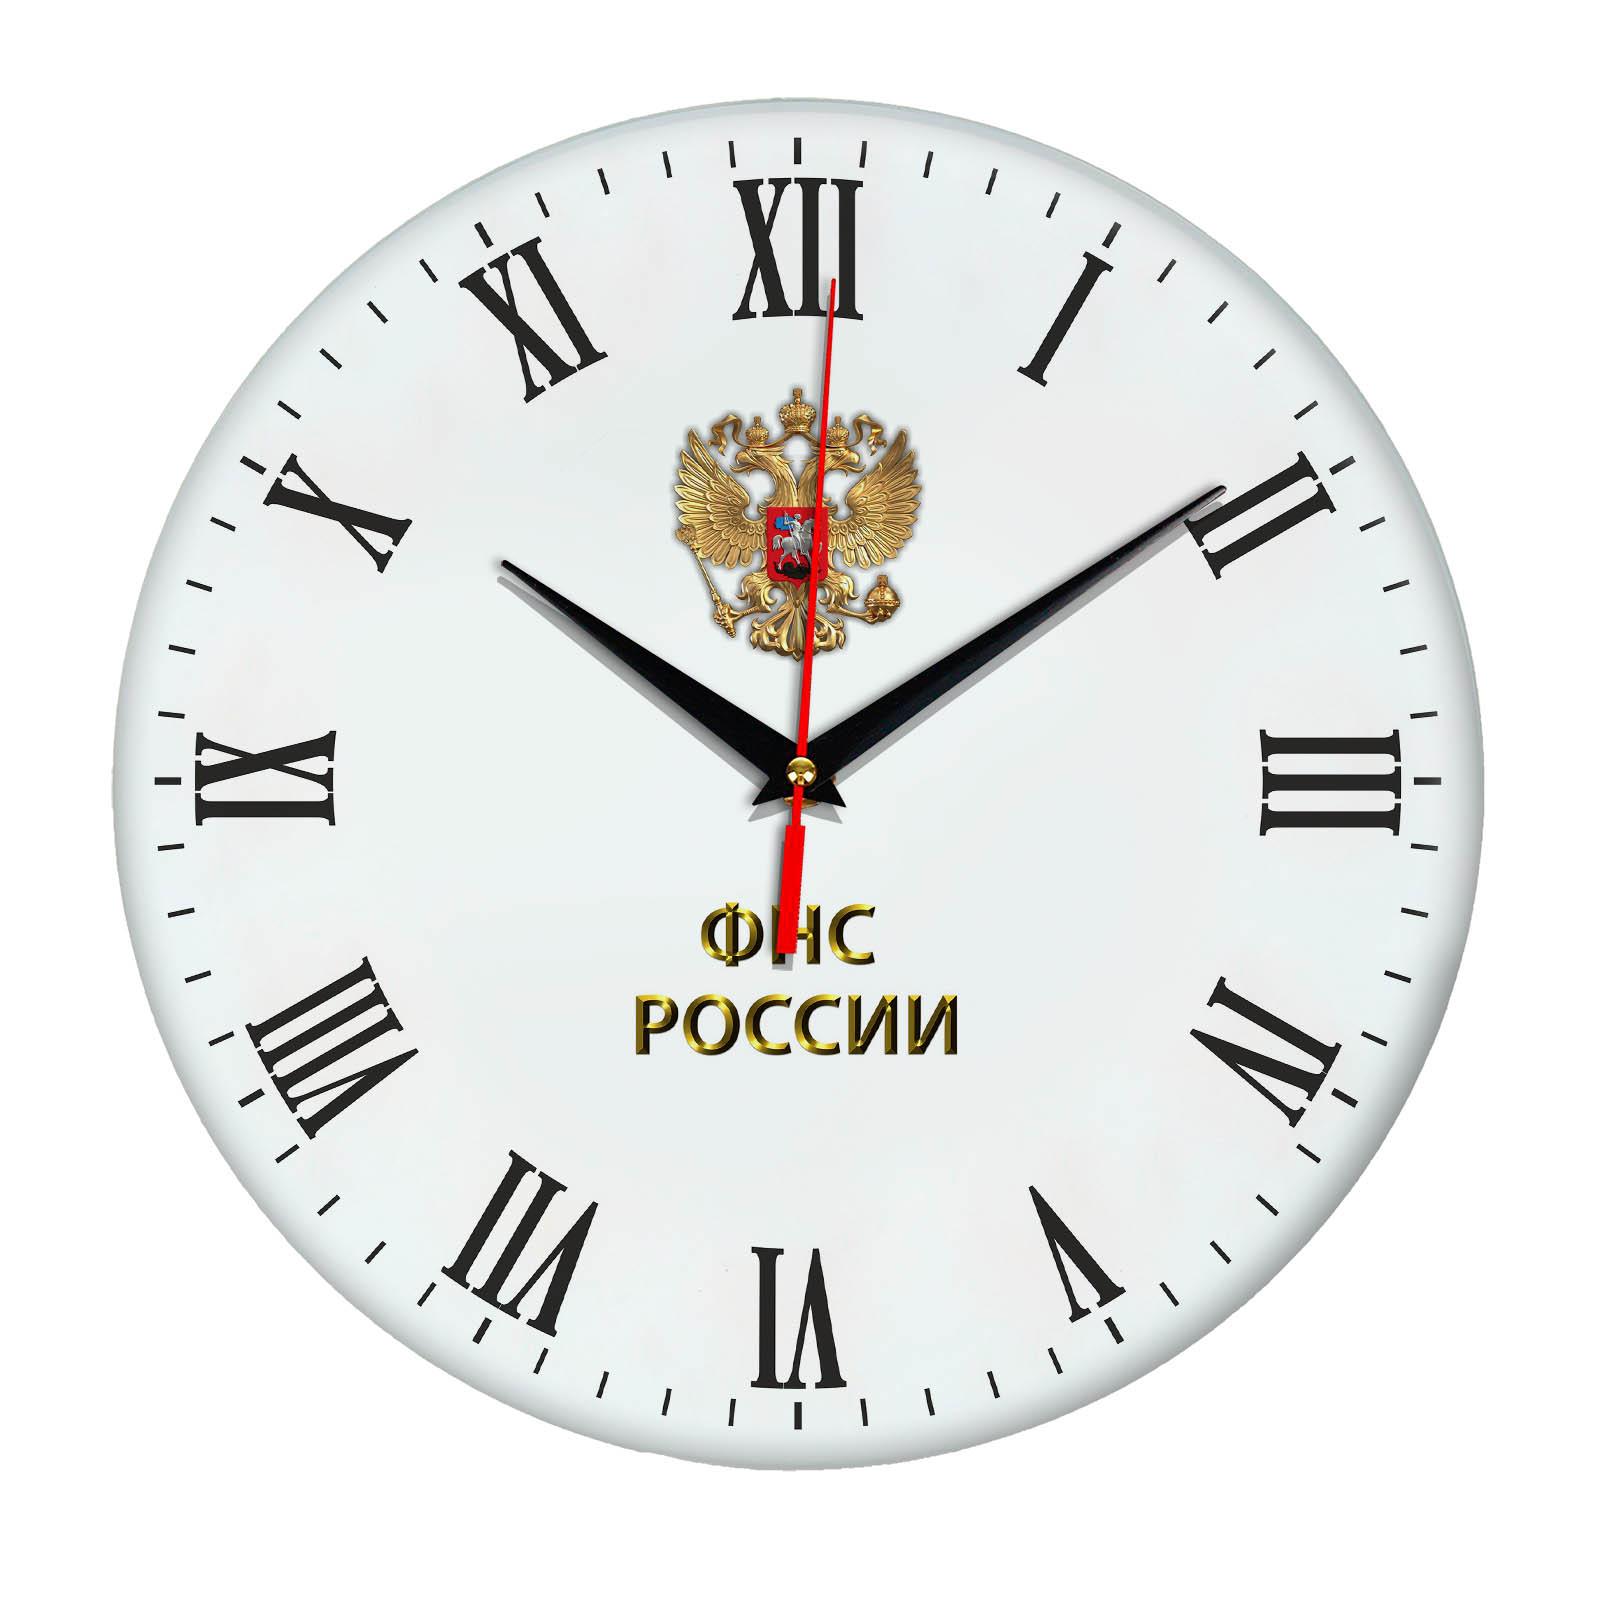 сувенир с логотипом ФНС России